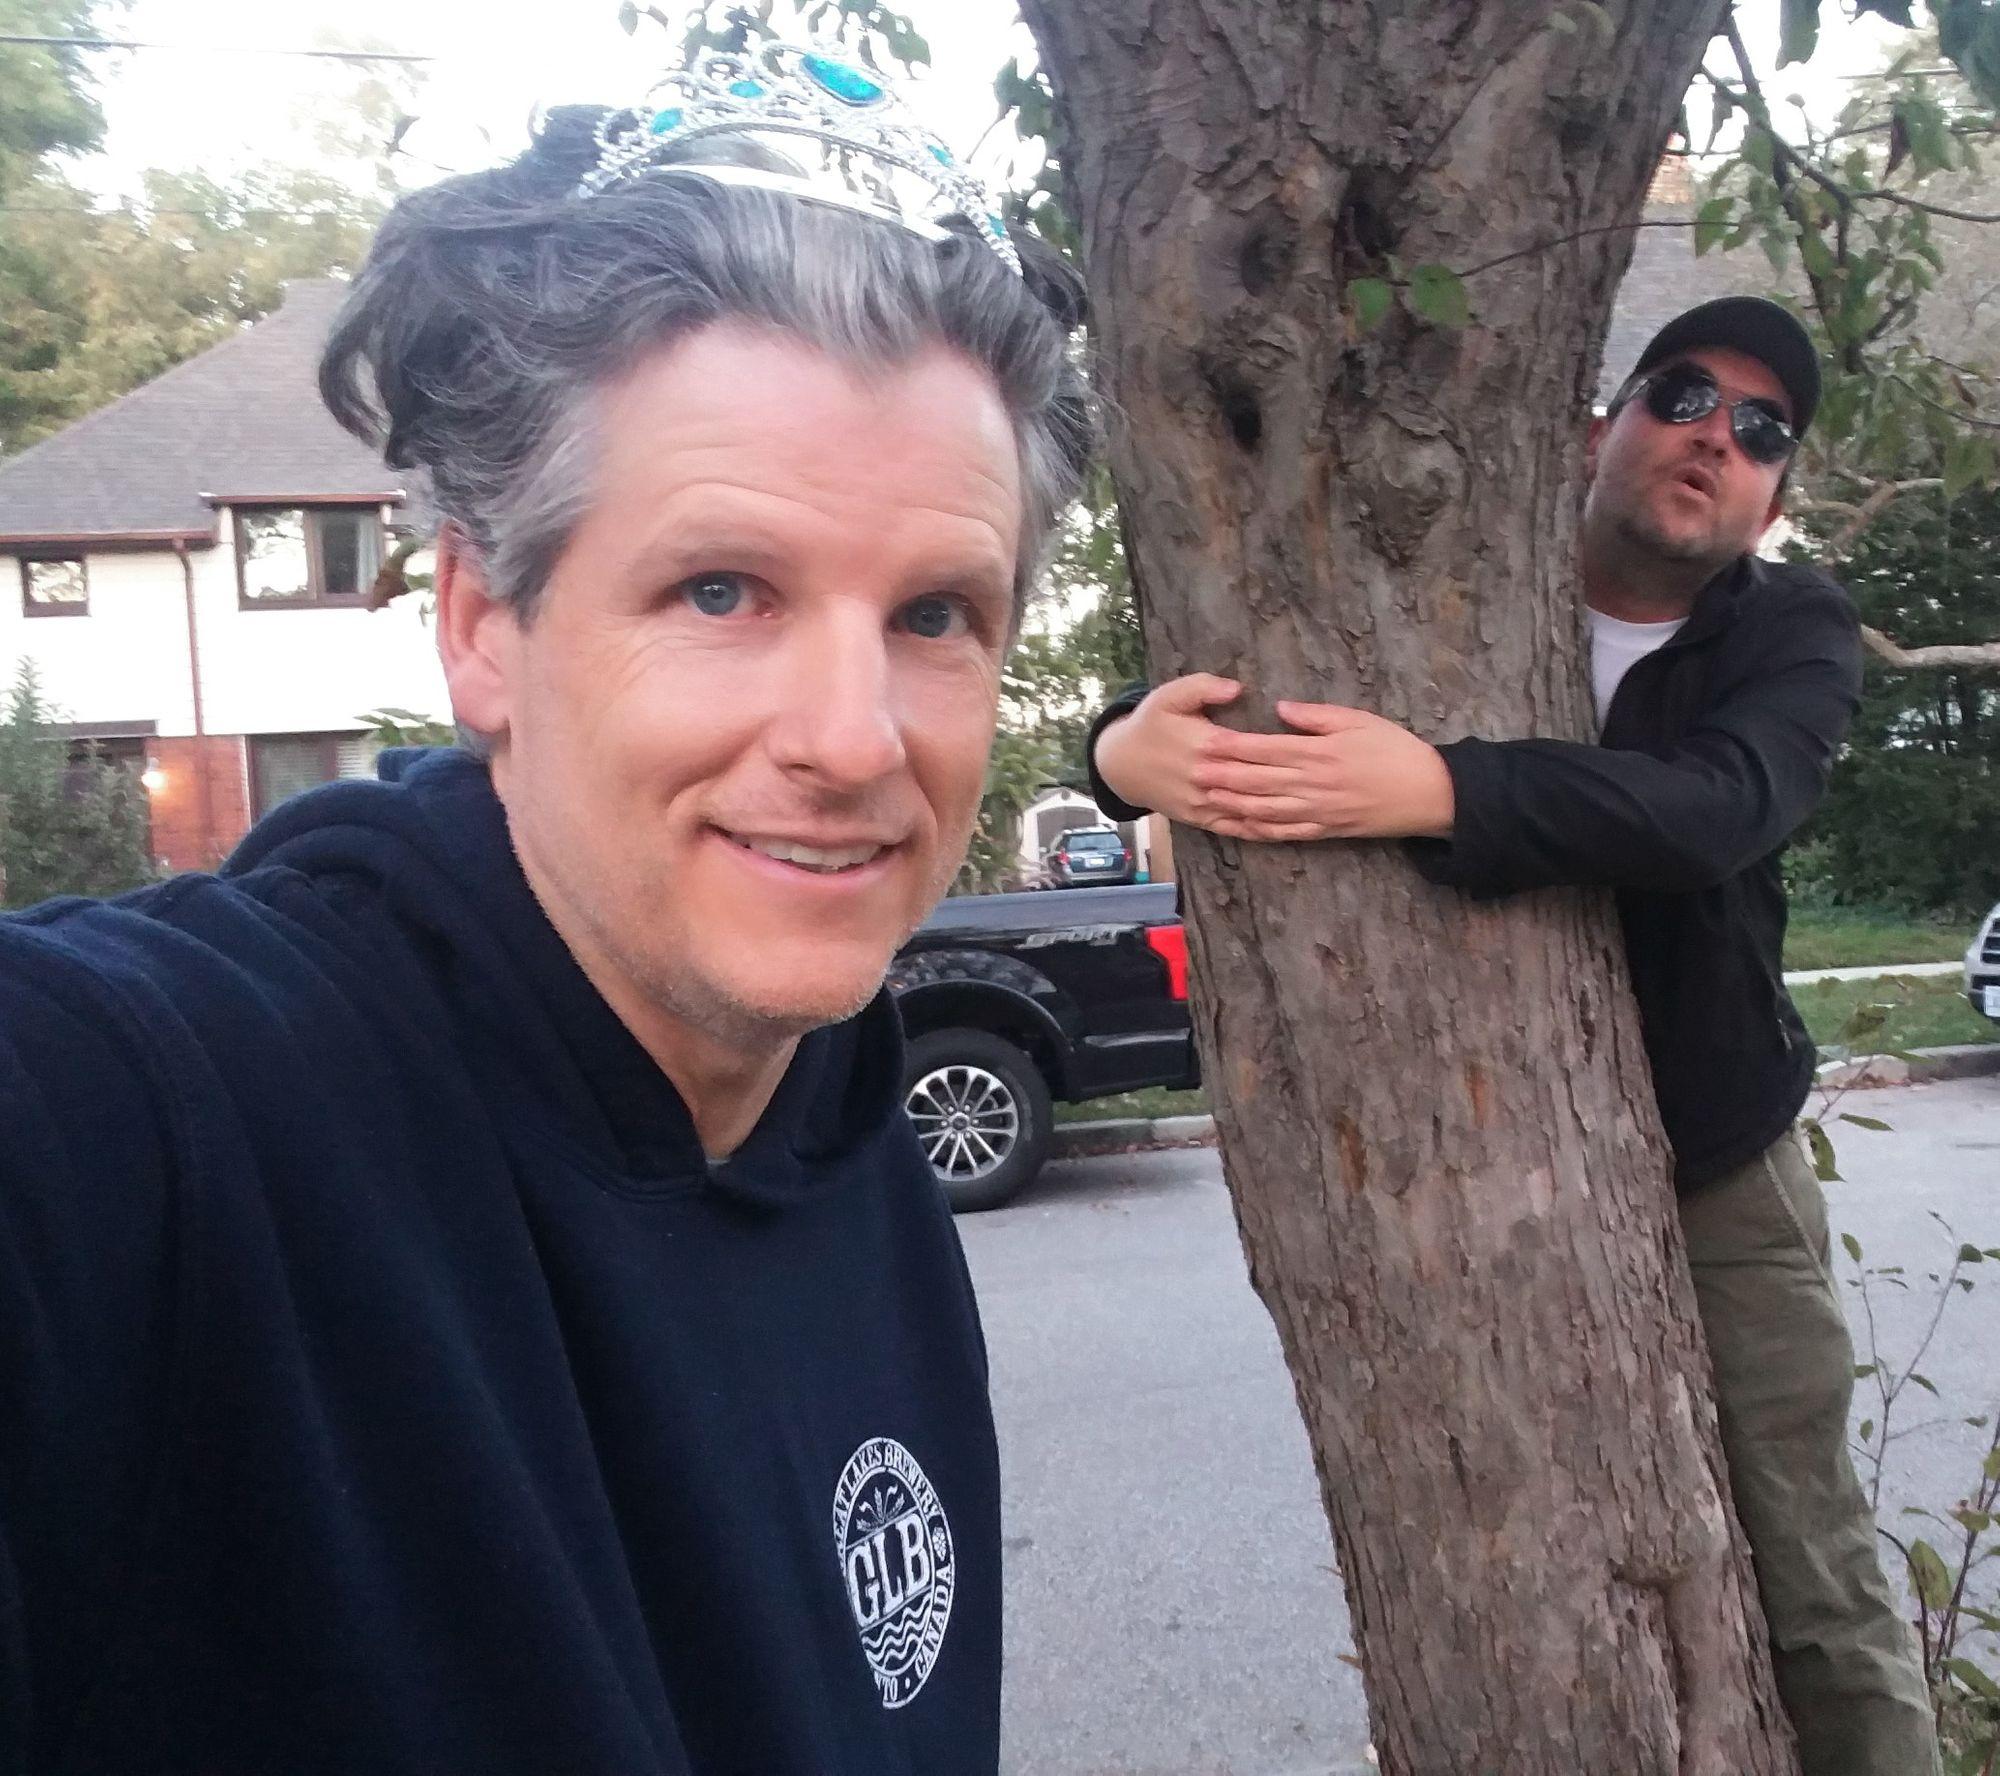 Toronto Mike'd Podcast Episode 731: Marc Weisblott from 12:36